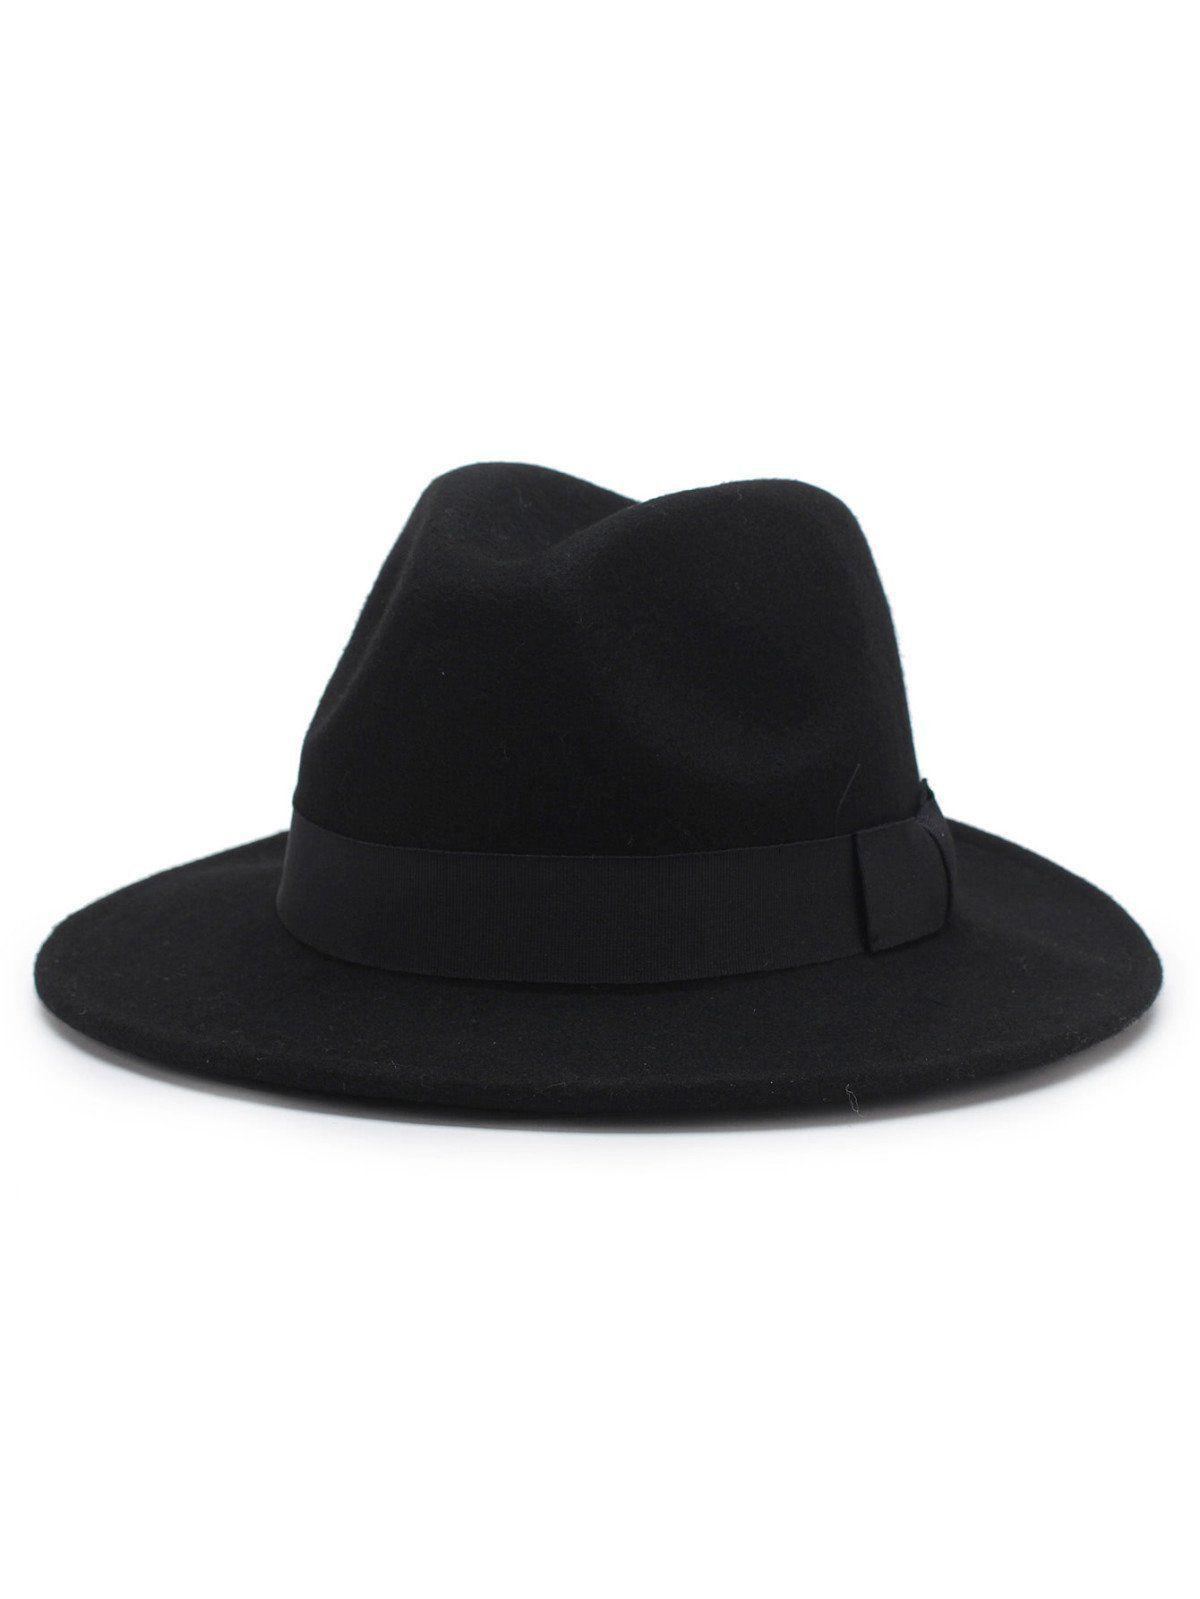 Bow Detail Wool Blend Panama Hat